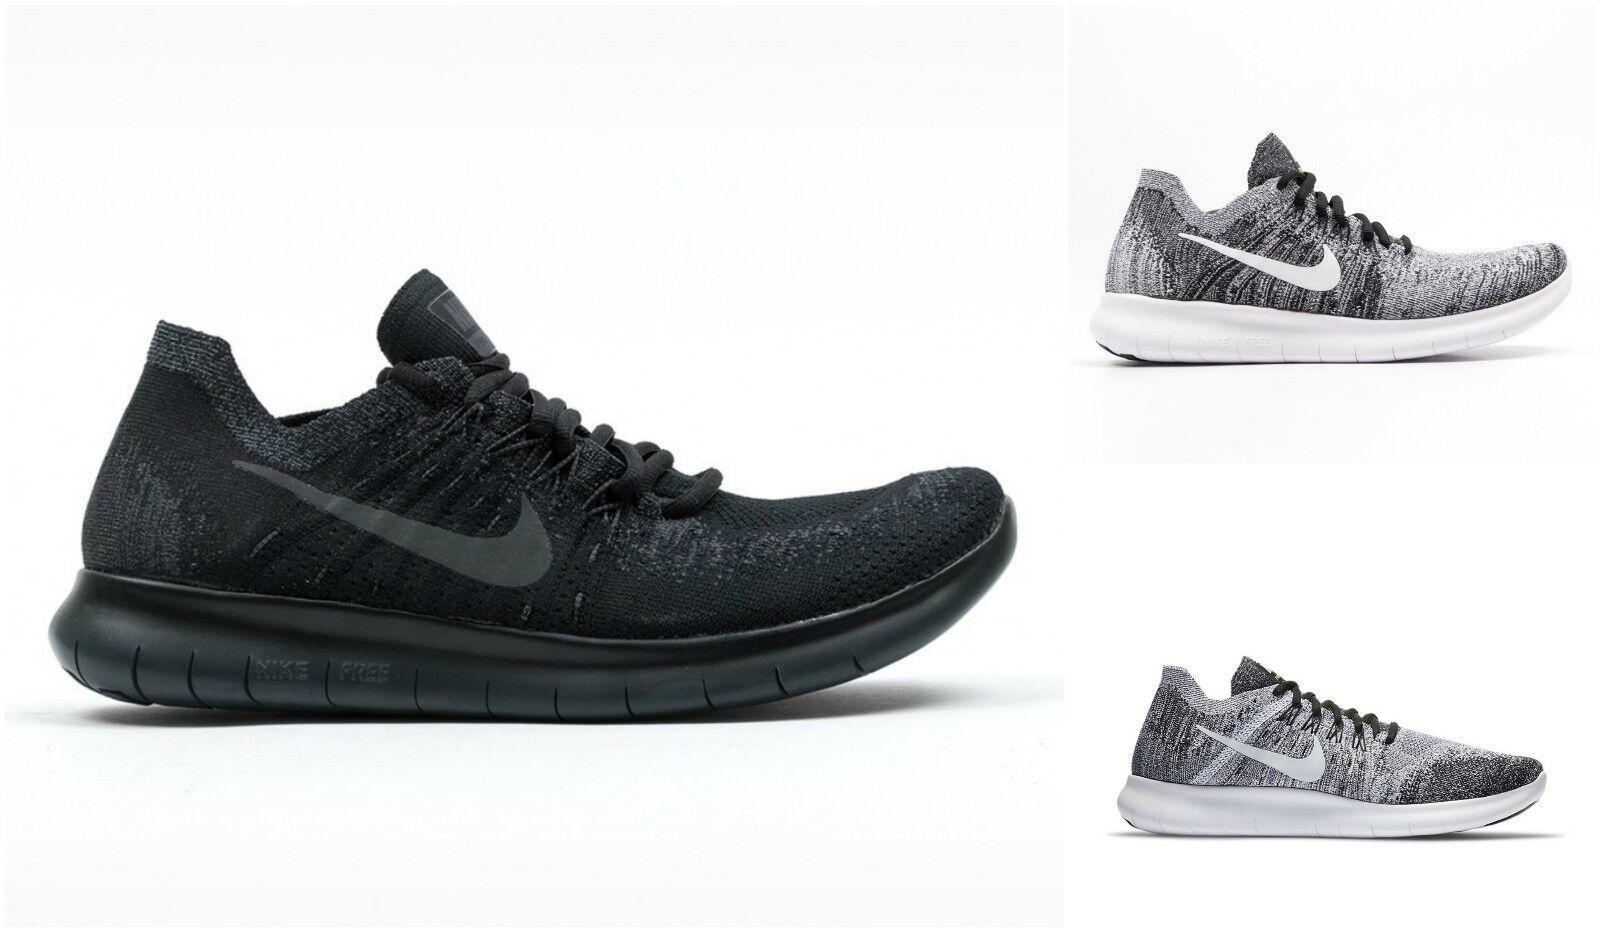 Nike Men's Free RN Flyknit 2017 Running shoes - 880843